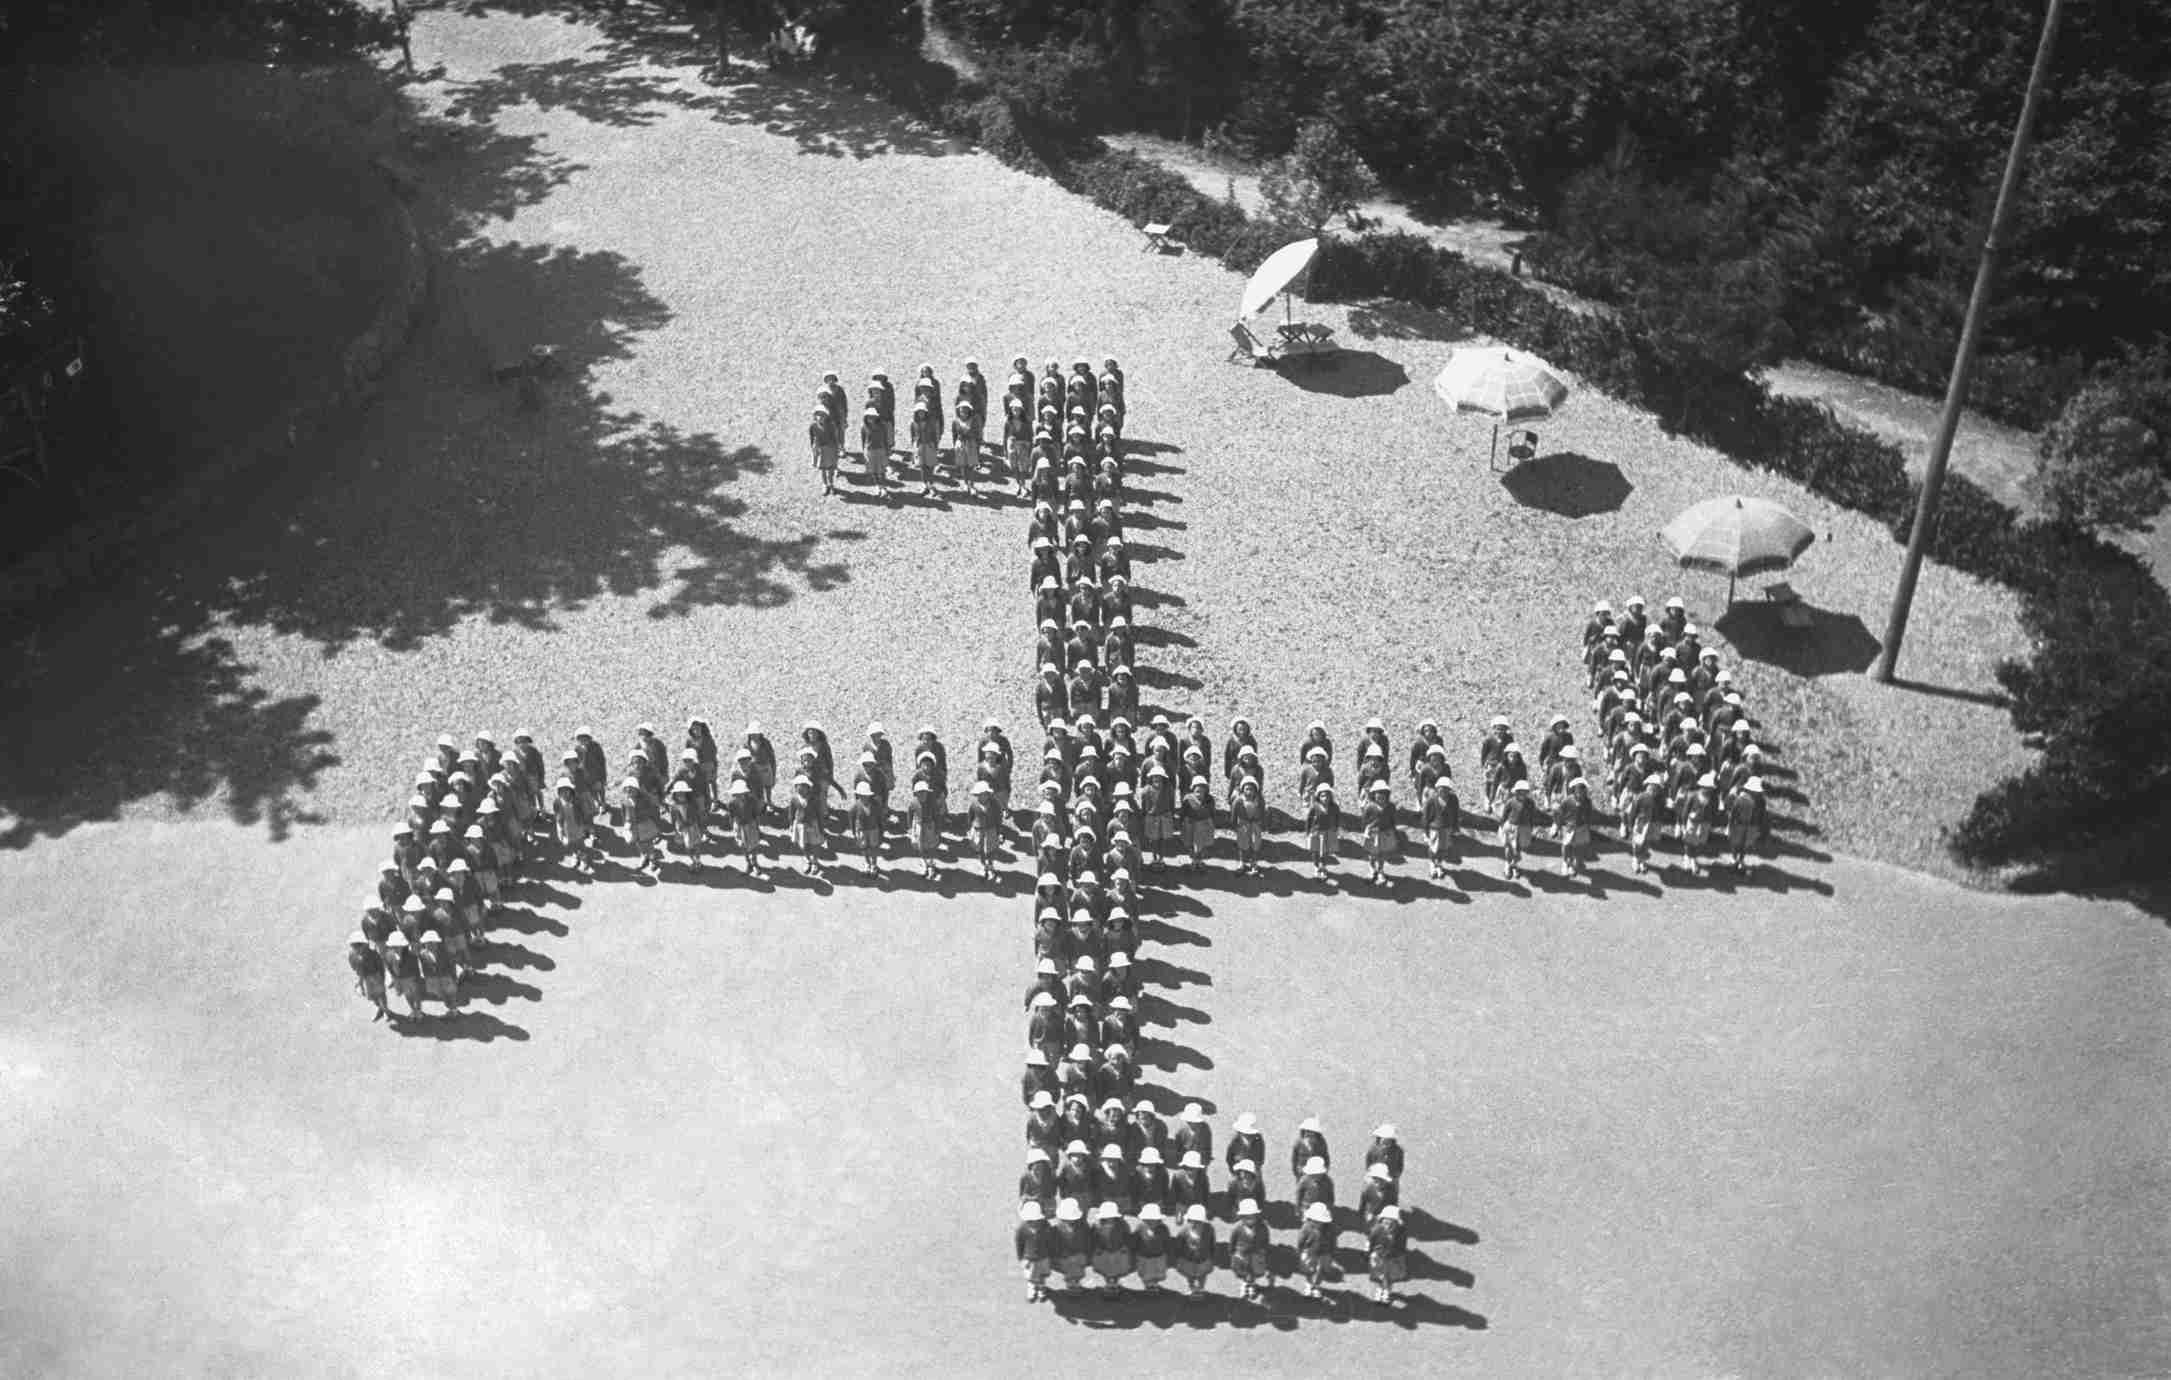 Italian girls' summer camp making up a Nazi swastika, August 8, 1942, Genoa, Italy.